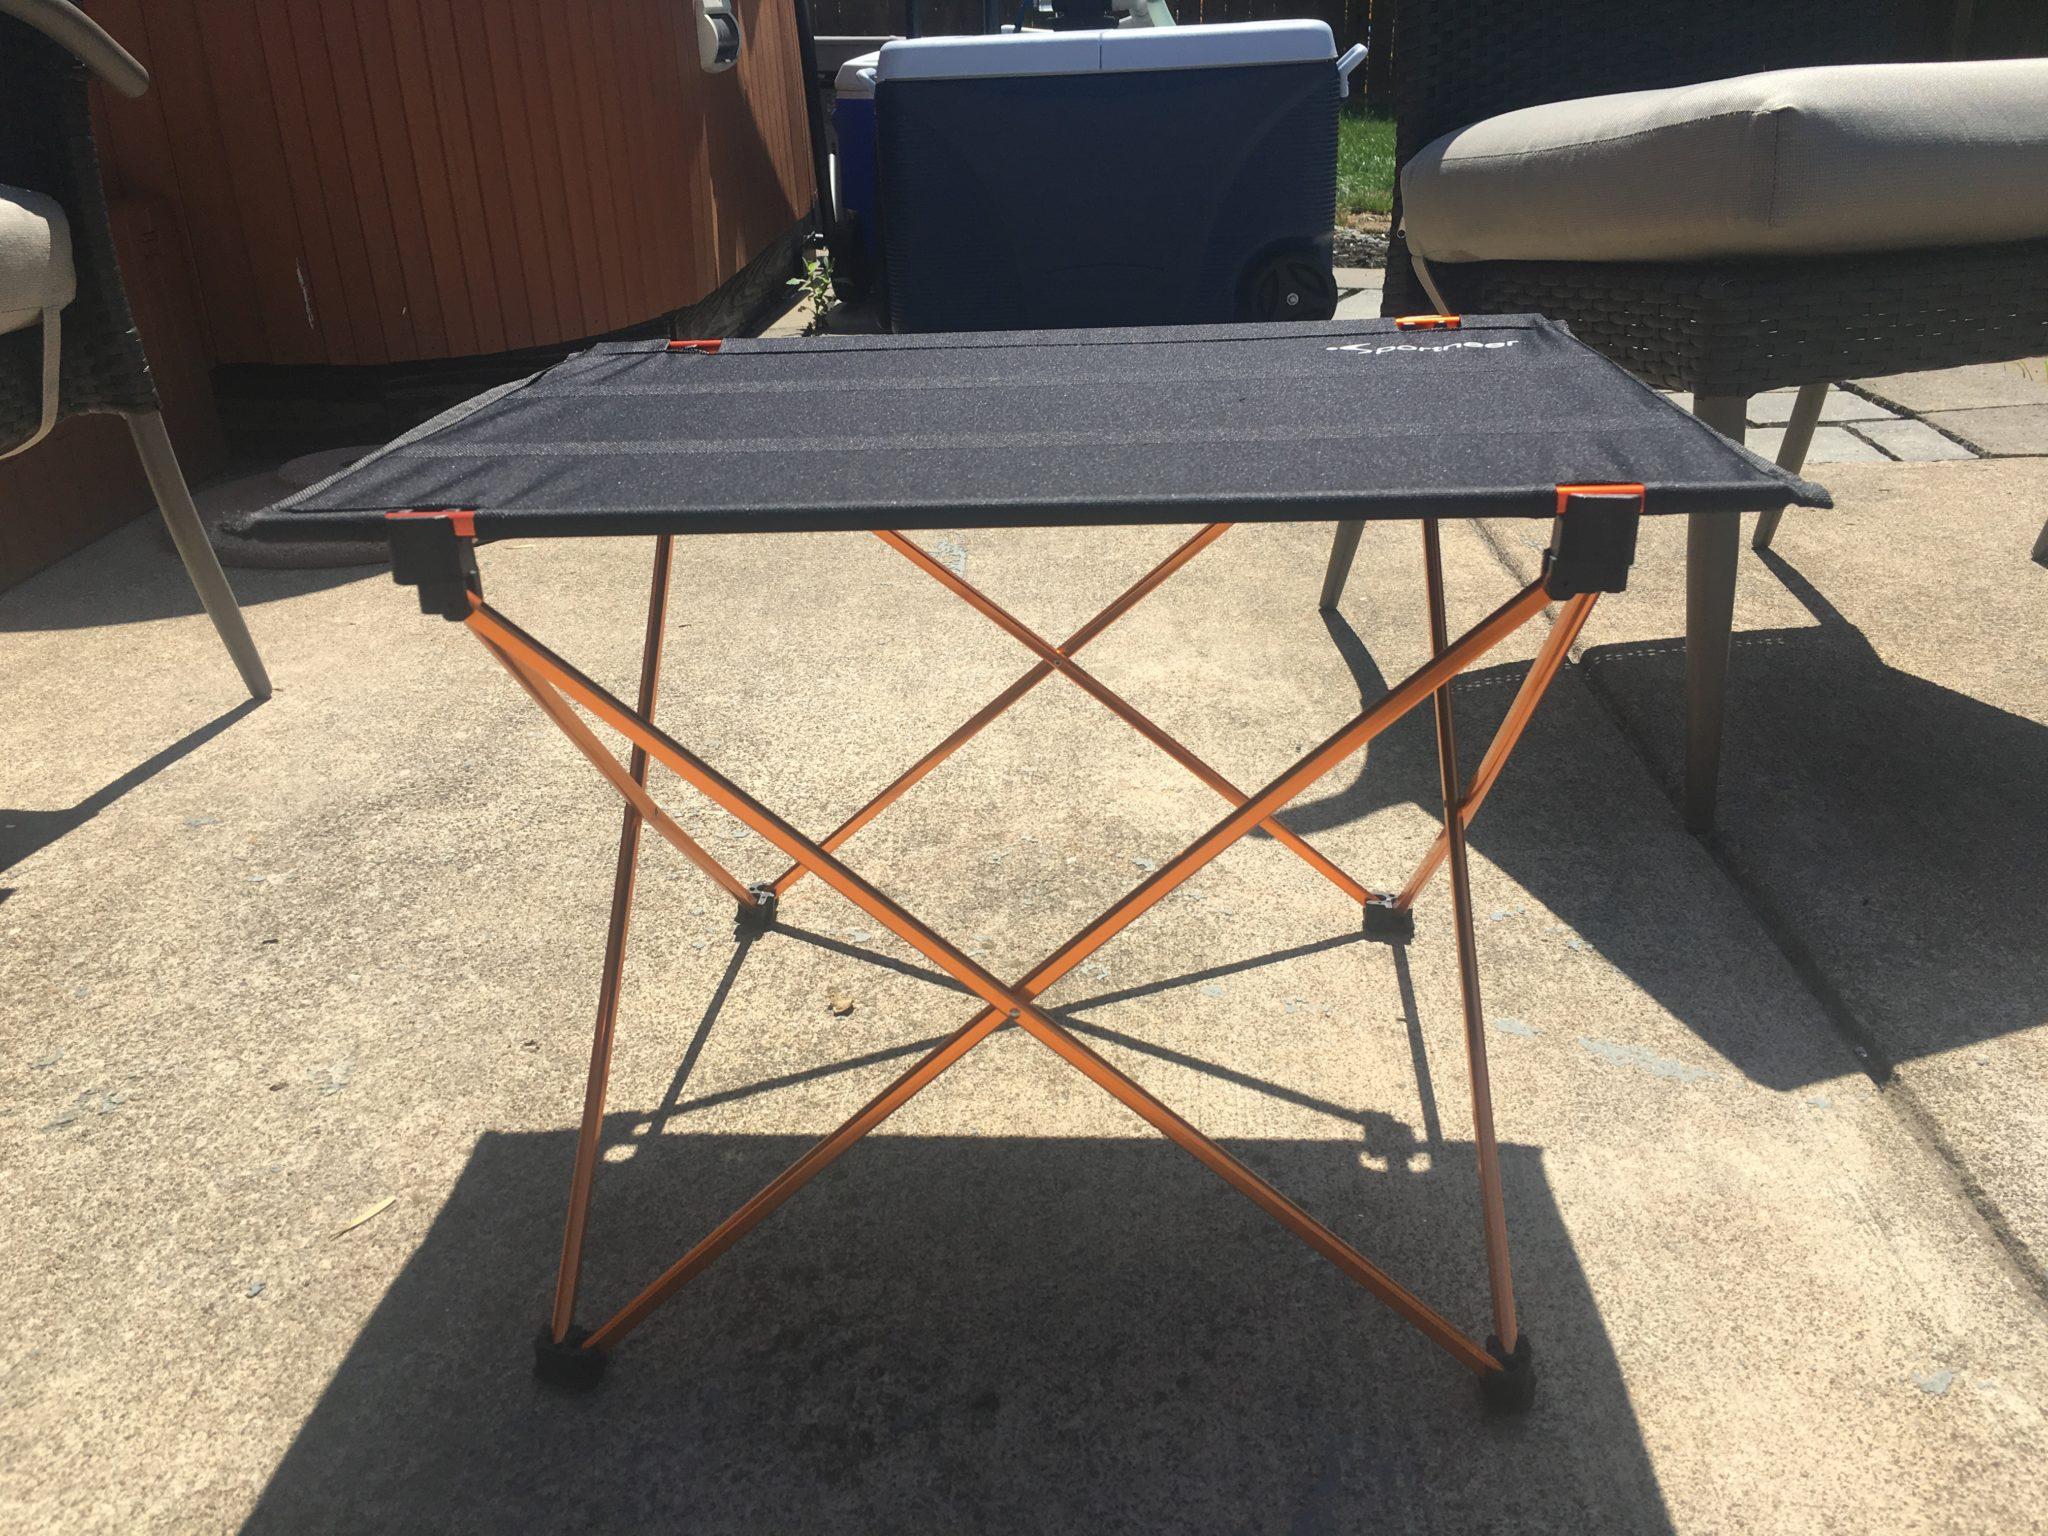 Portable Lightweight Folding Picnic Table